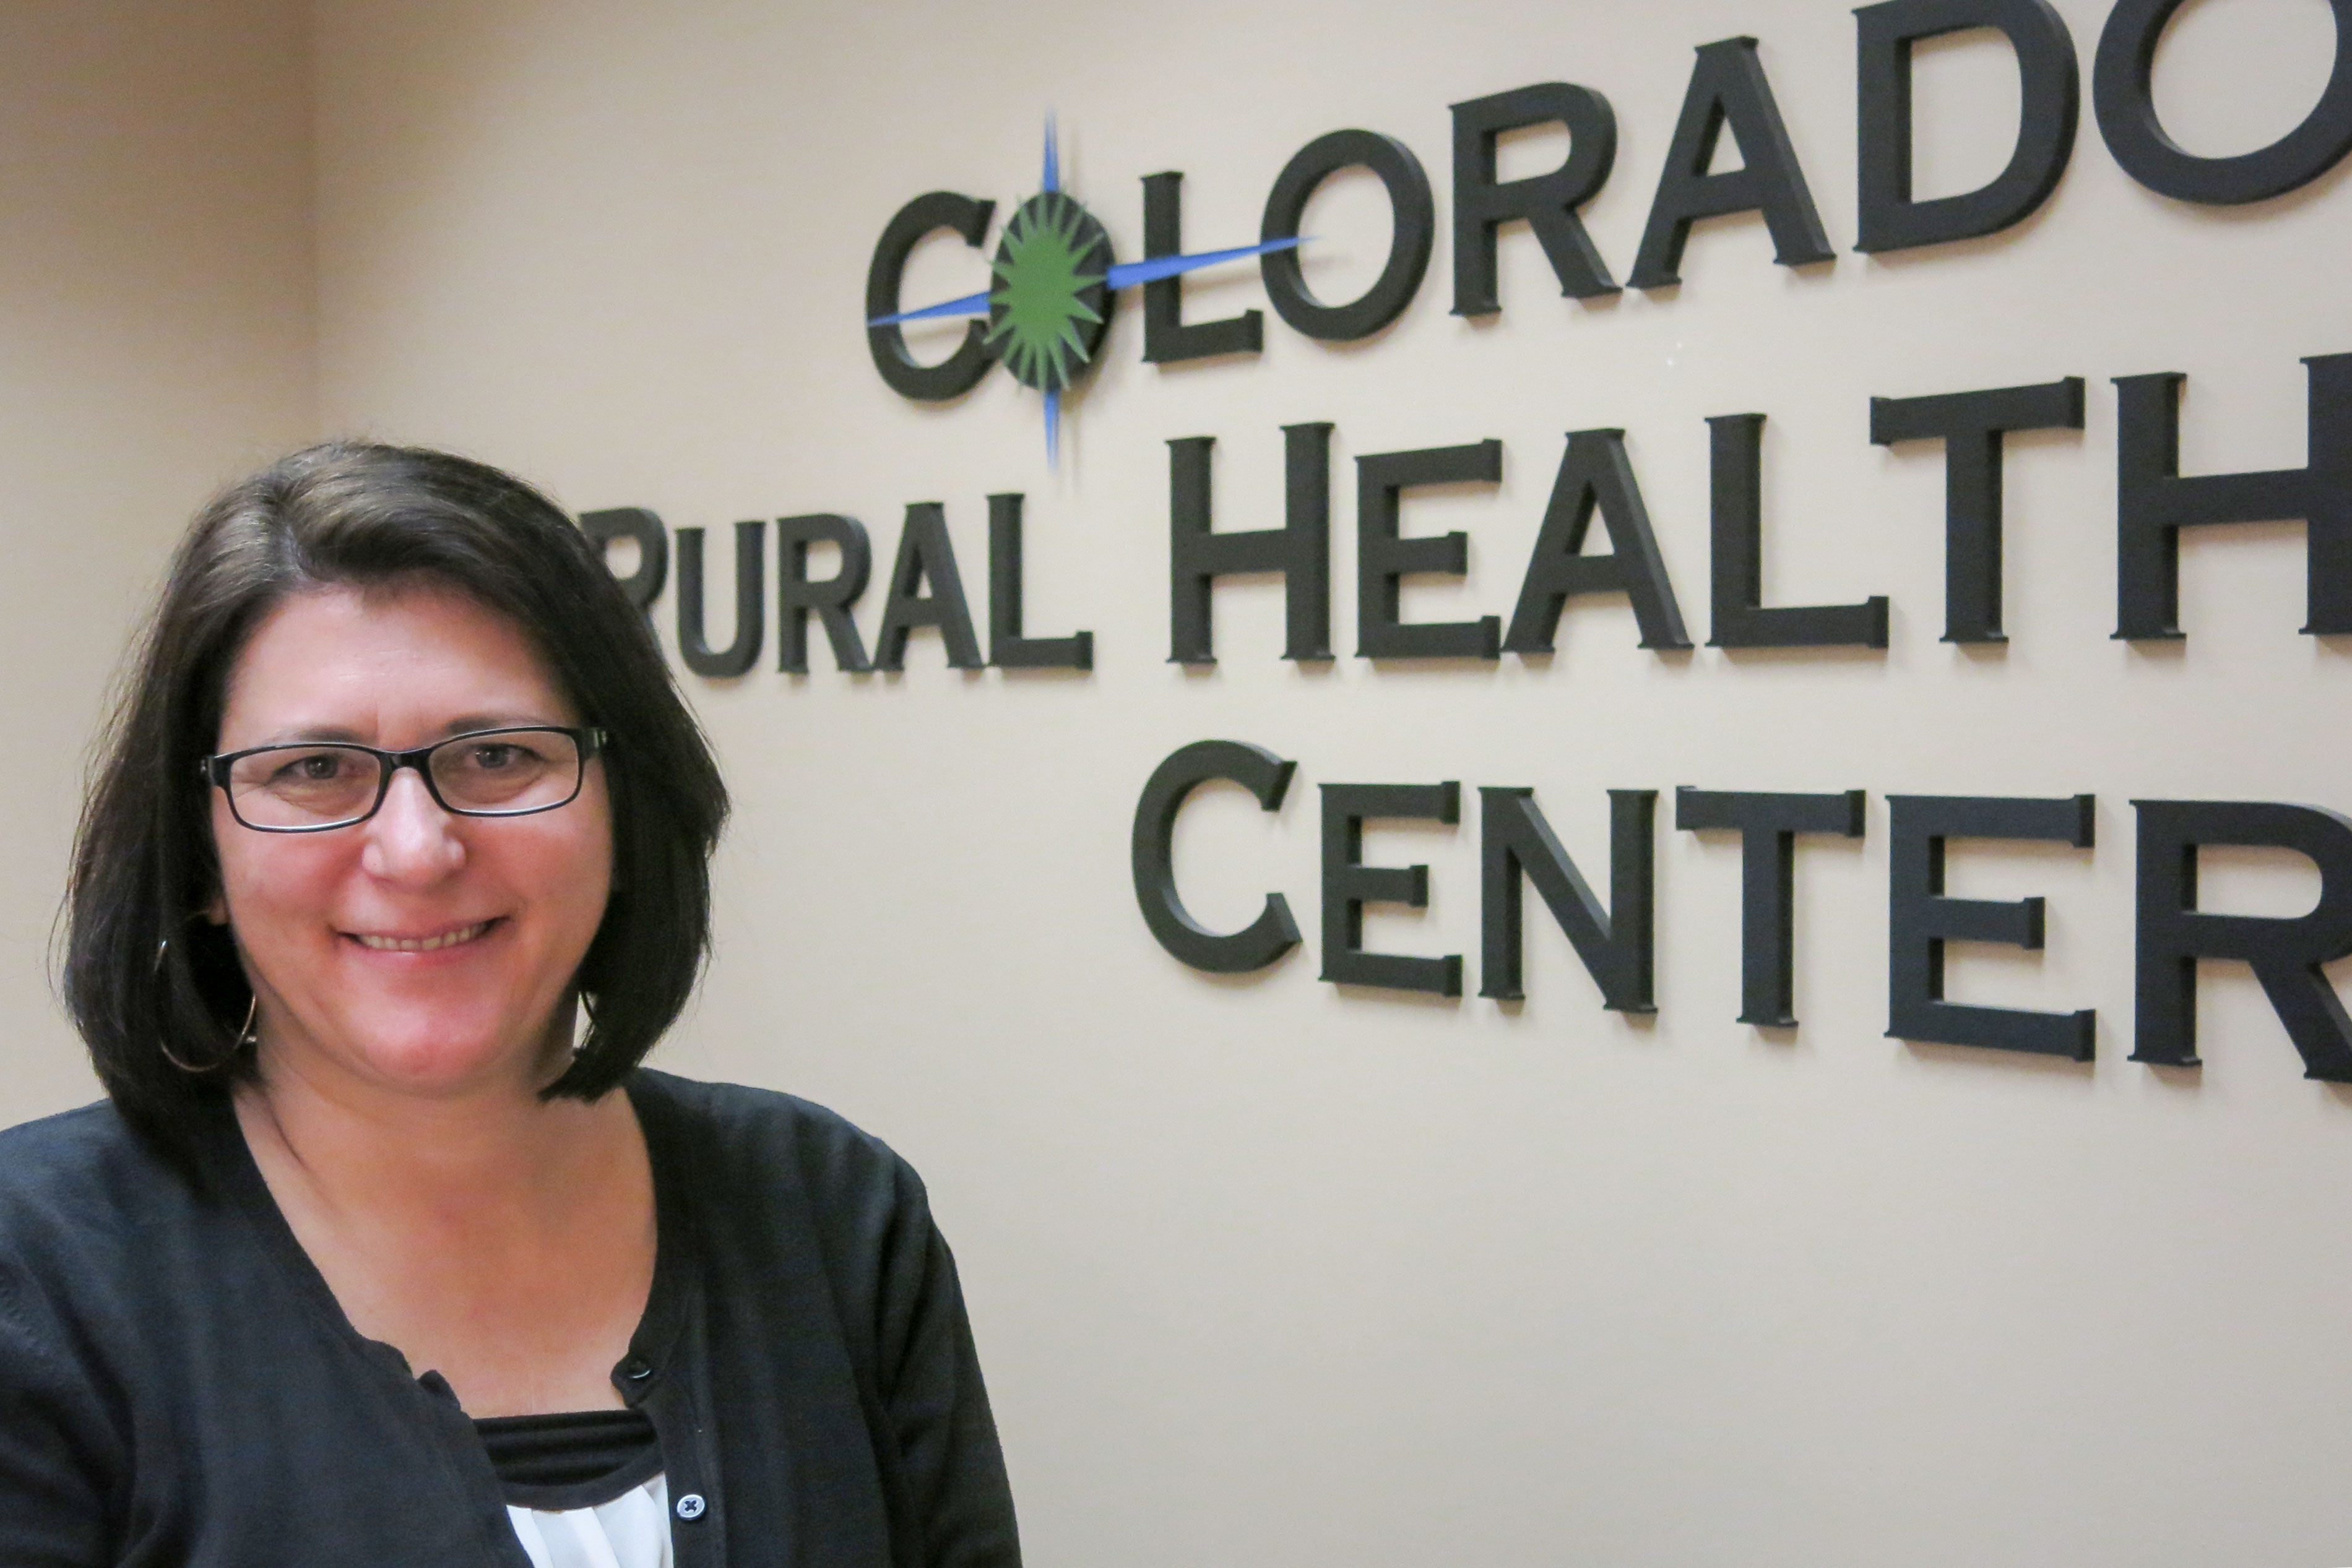 Photo: Medicaid Rural Hospitals | CO Rural Hopital Center CEO Michelle Mills - JDaley